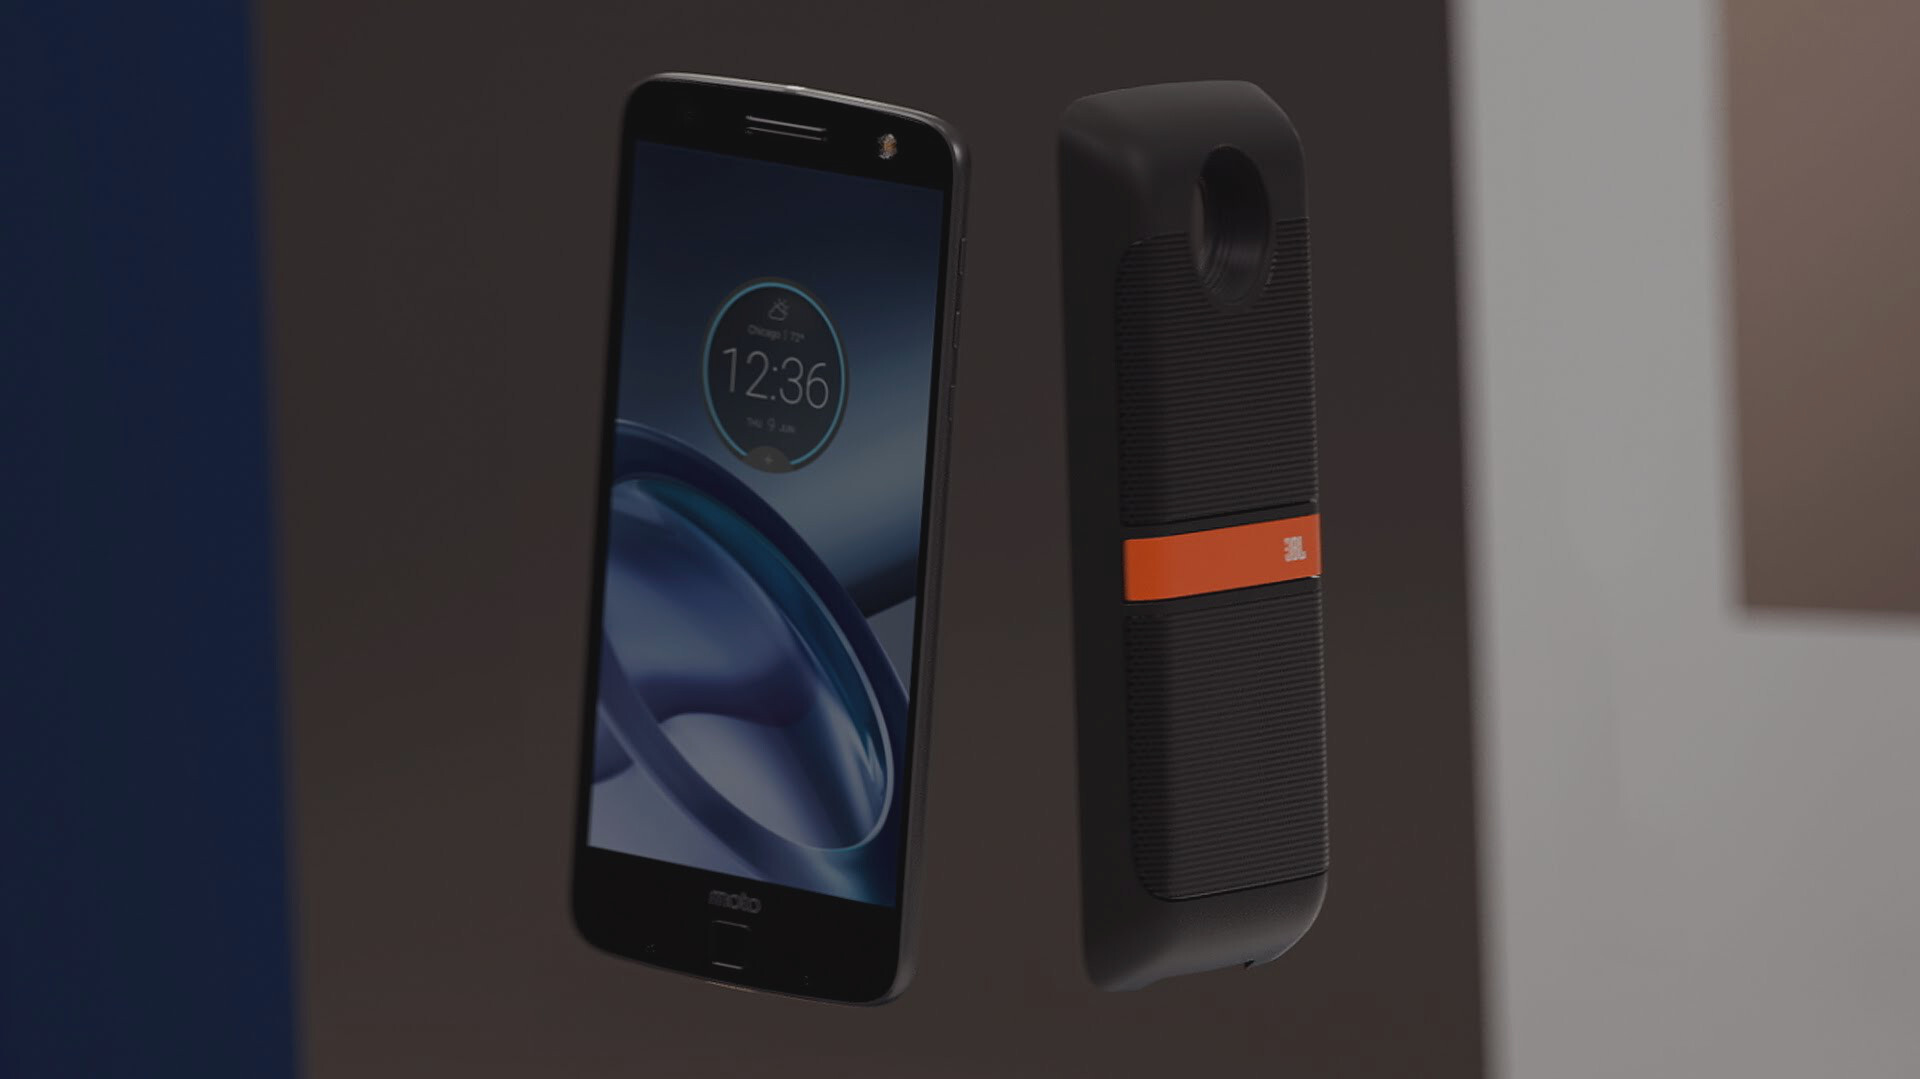 The JBL SoundBoost add-on for the Moto Z/Z Force cranks up ...